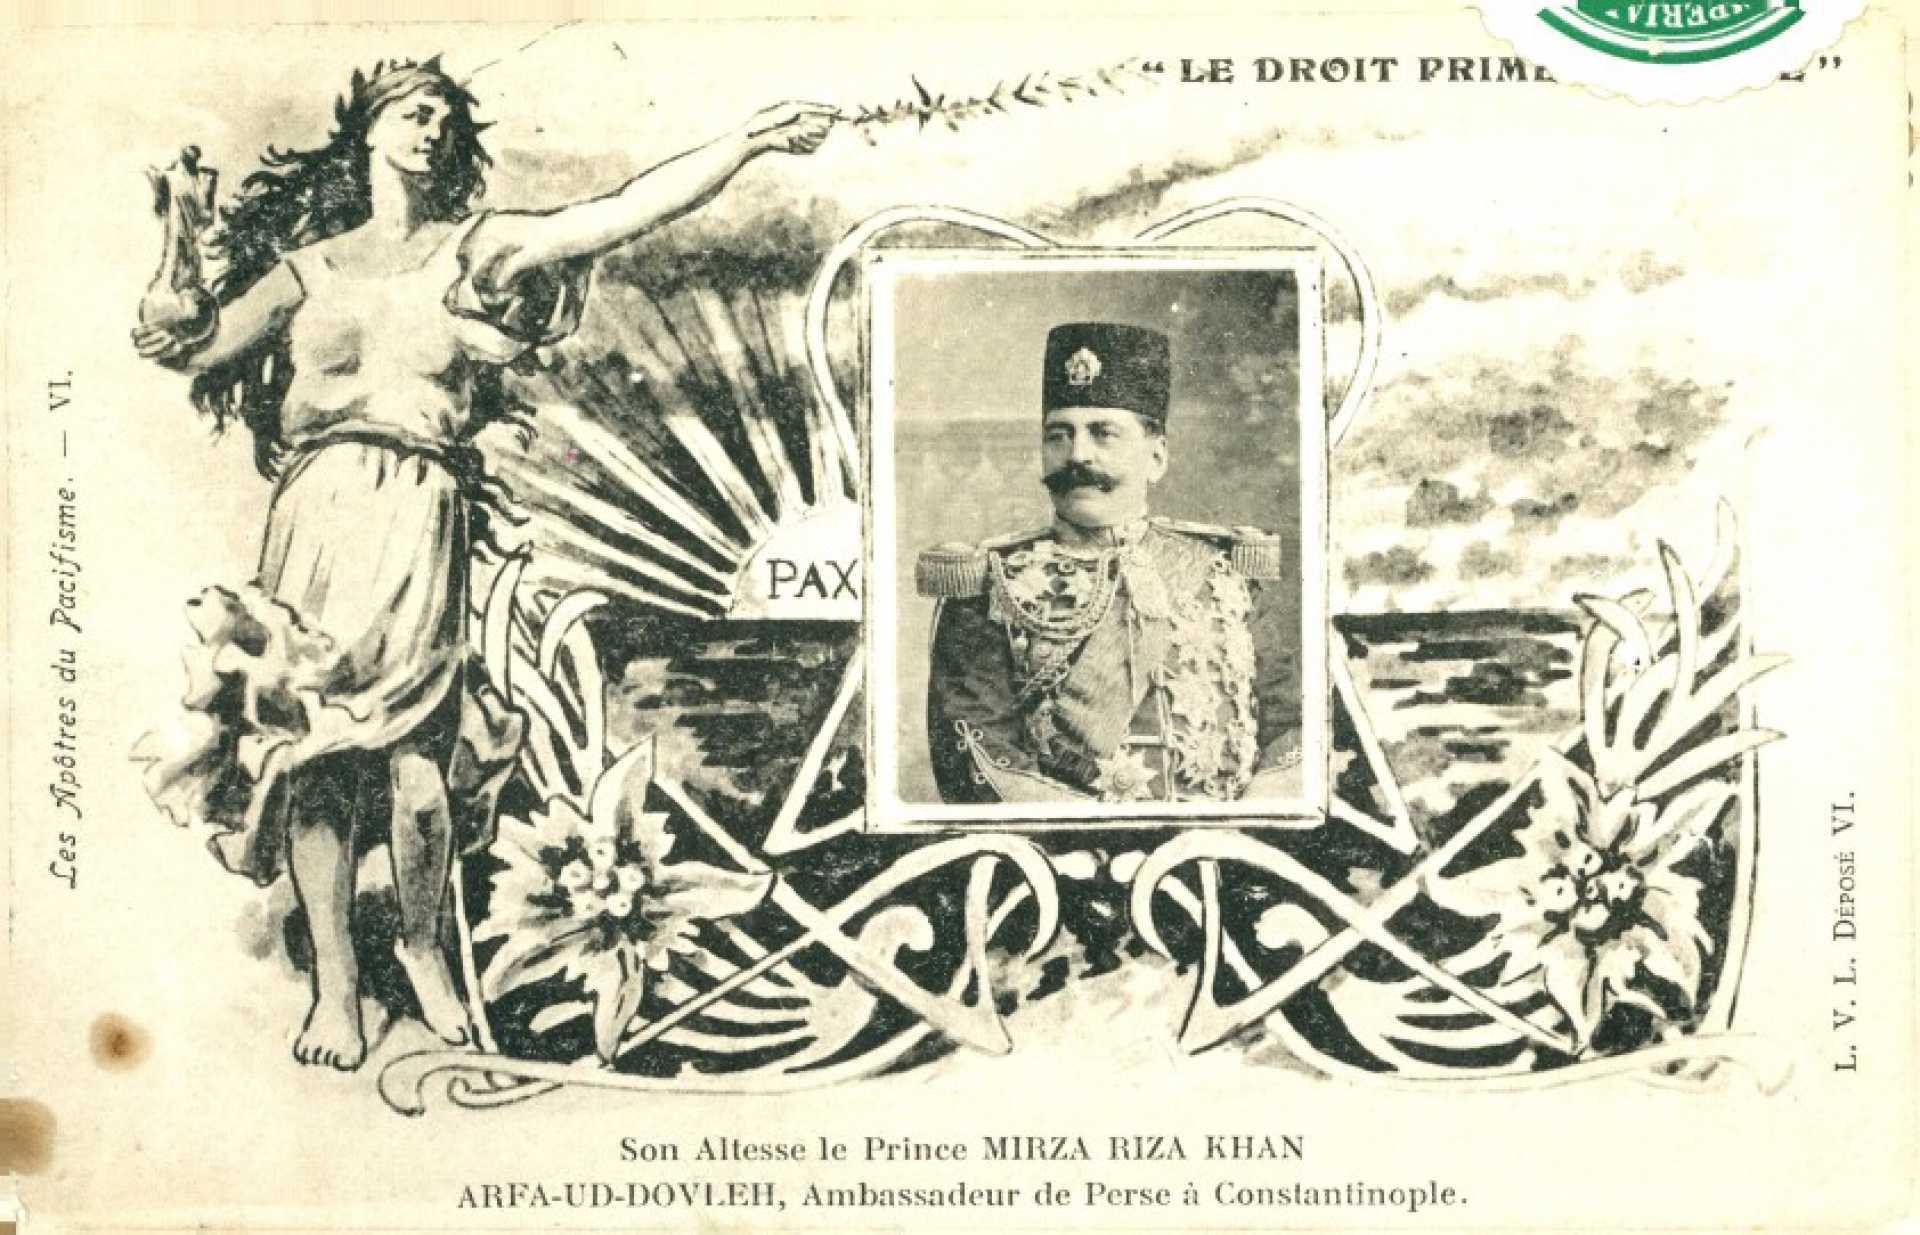 Son Altesse le Prince Mırza Rıza khan Arfa-Ud-Dovleh. Ambasadeur de Persse a Constantinople